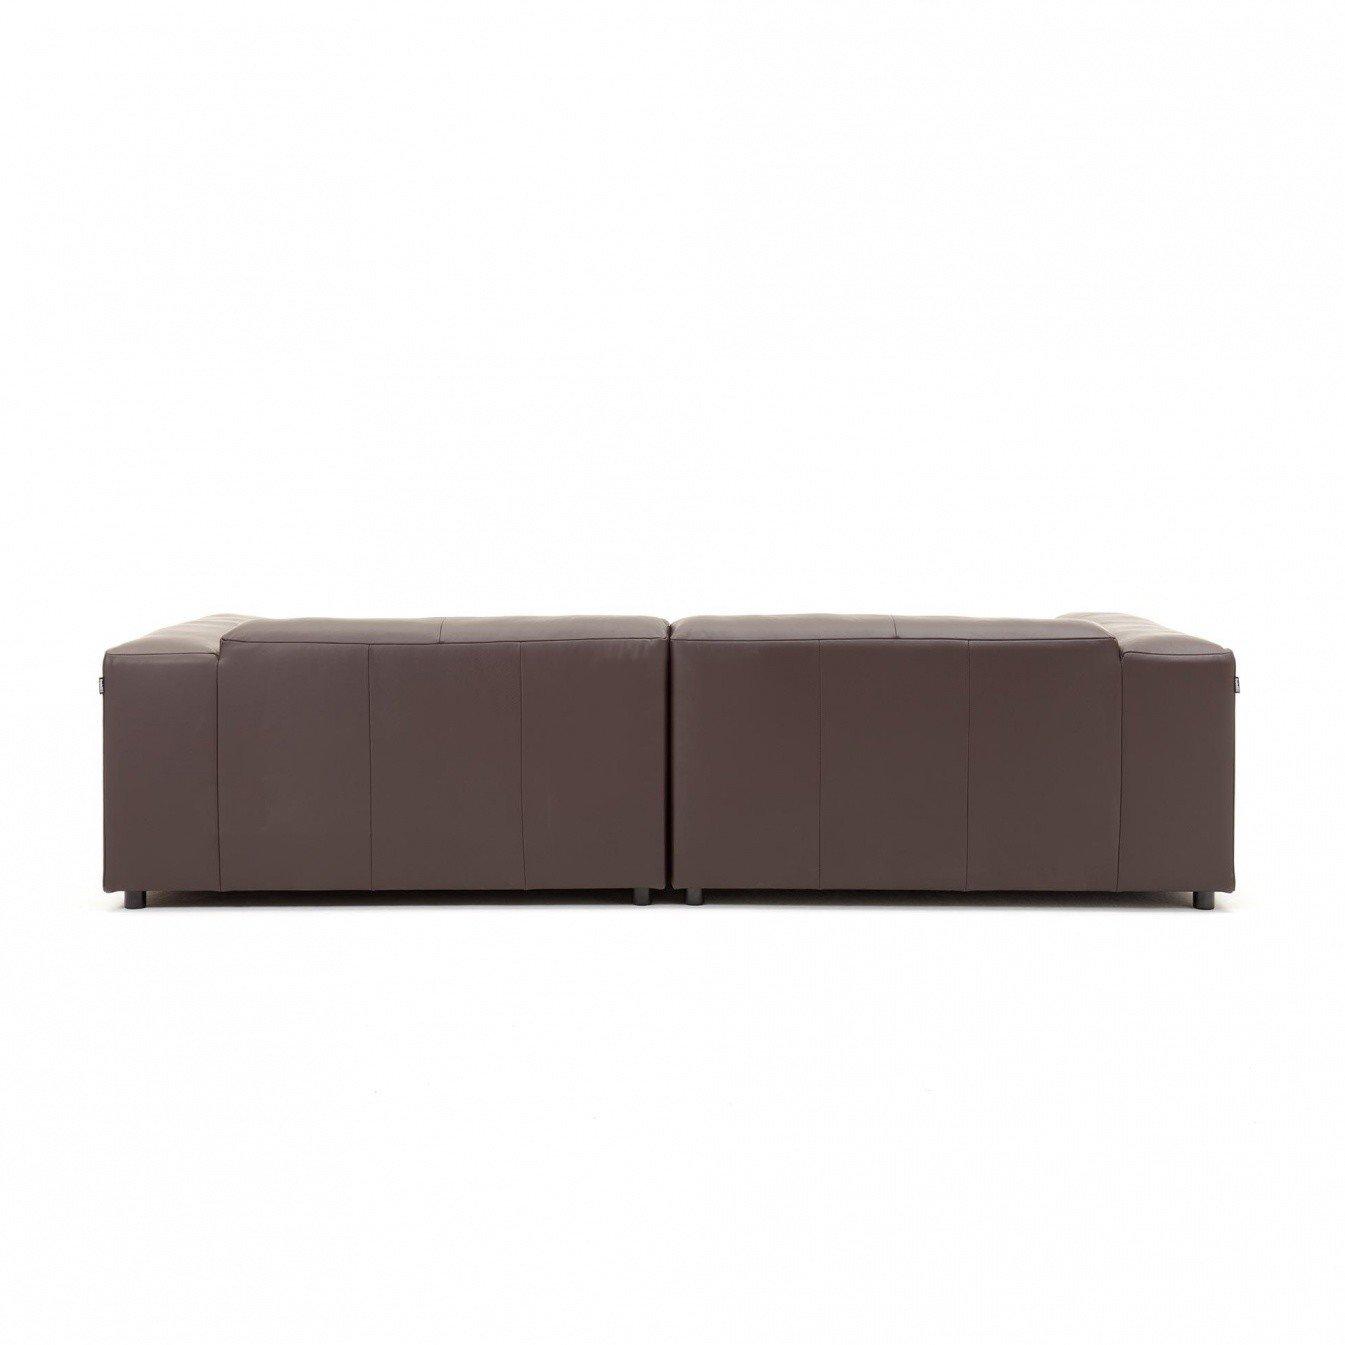 Top freistil 187 3-Seater Leather Sofa | freistil Rolf Benz  GP72